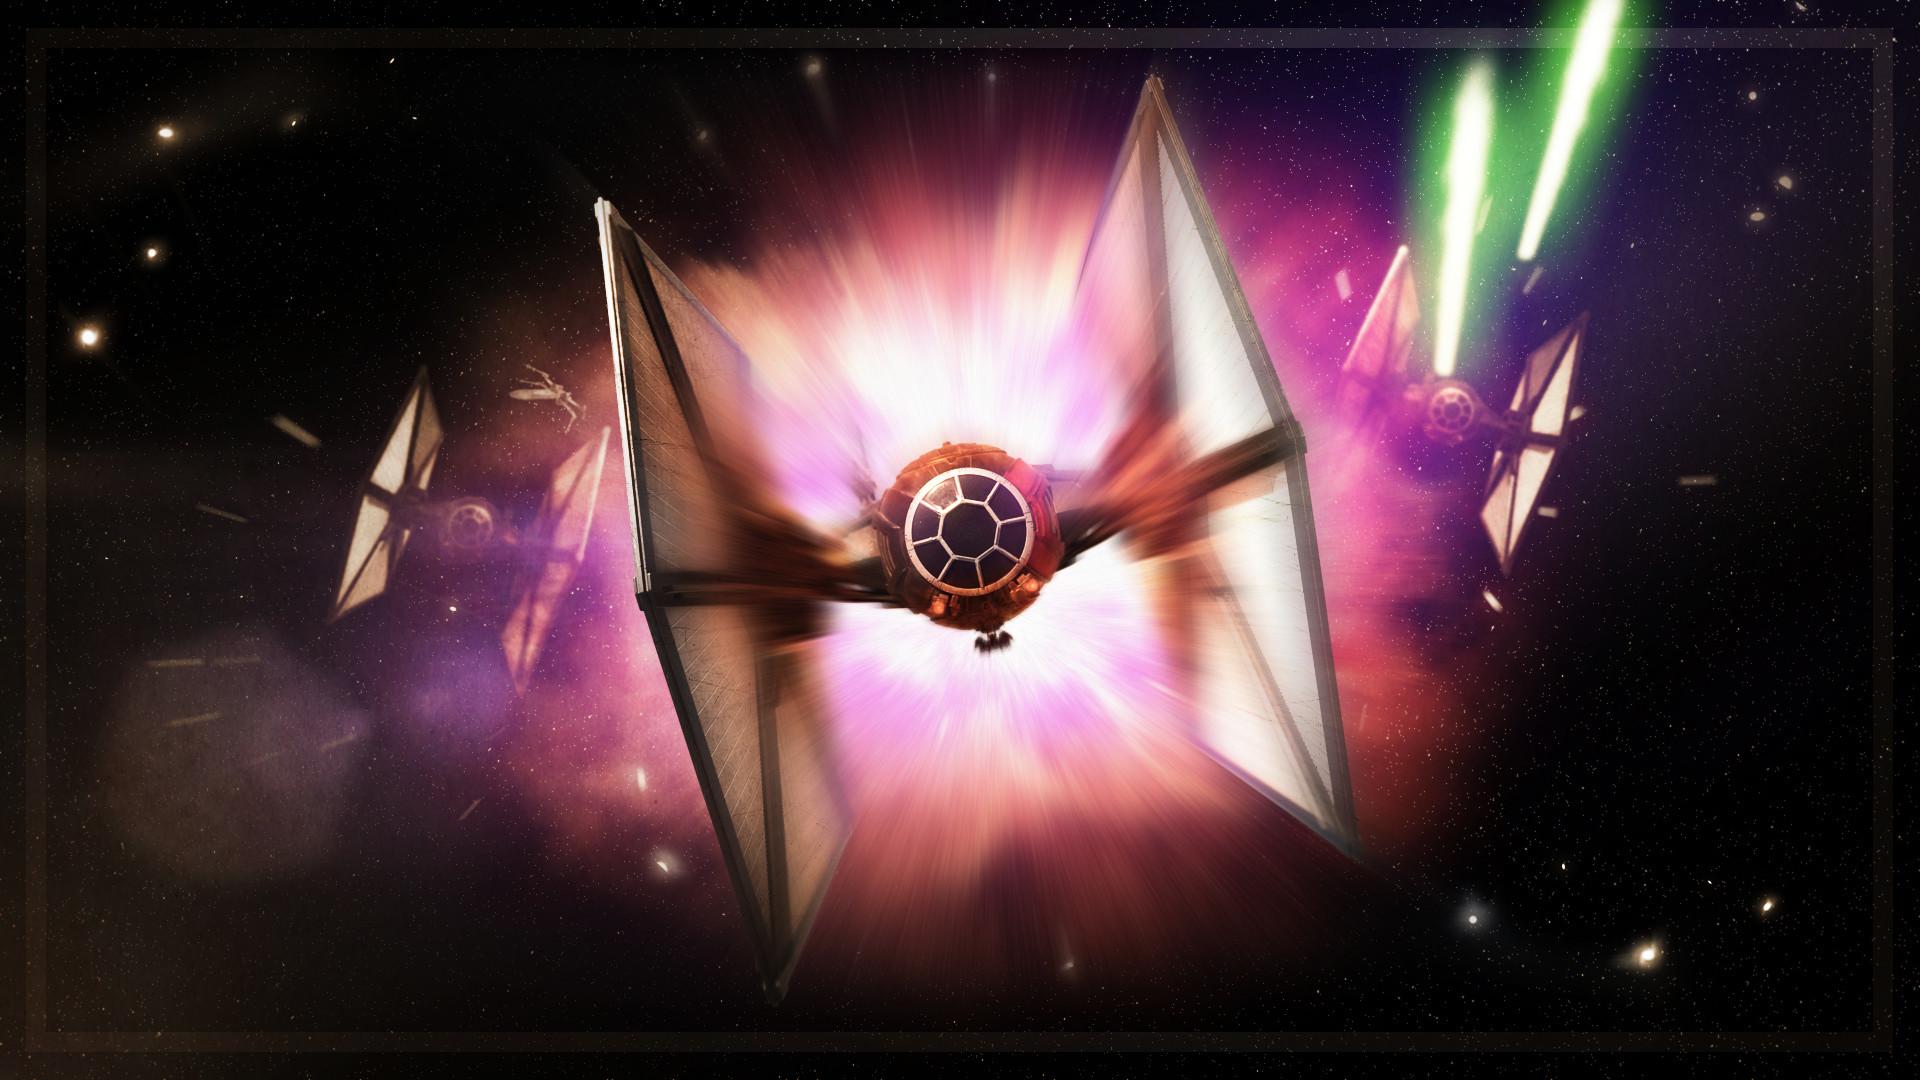 Star Wars: Tie Fighter Wallpaper (1920×1080) by Valkia